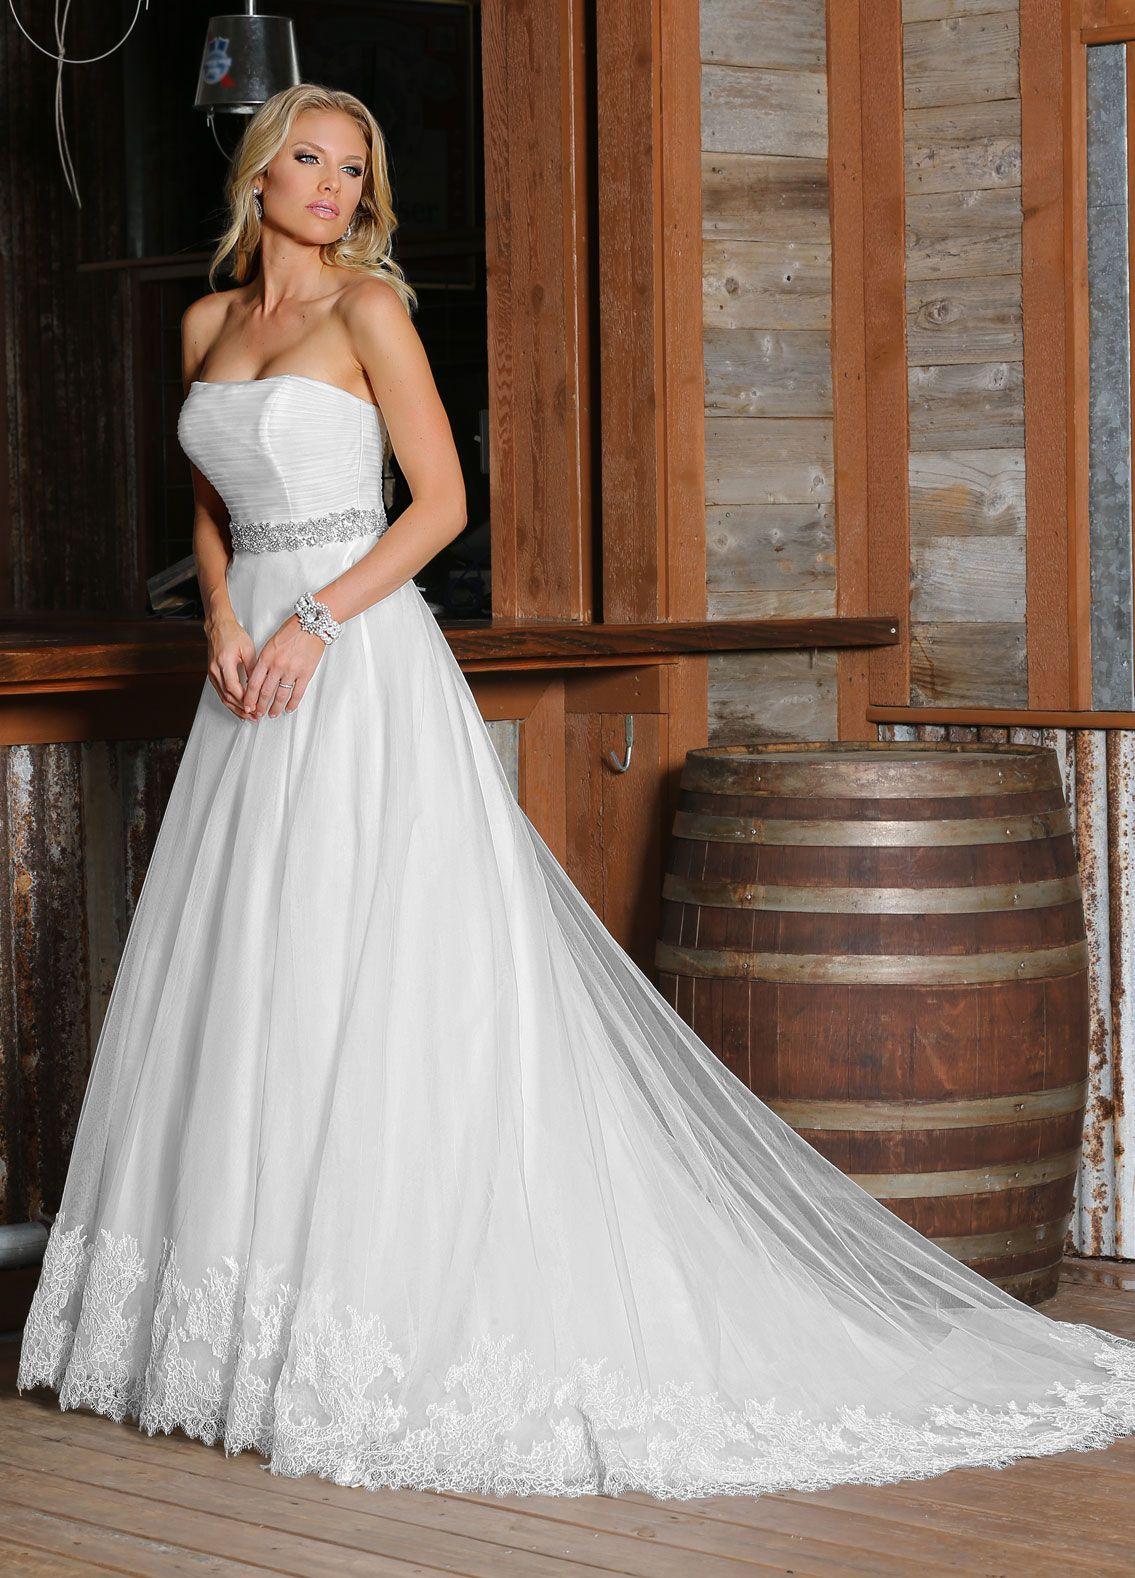 Select davinci a line wedding dress style for a classic bridal